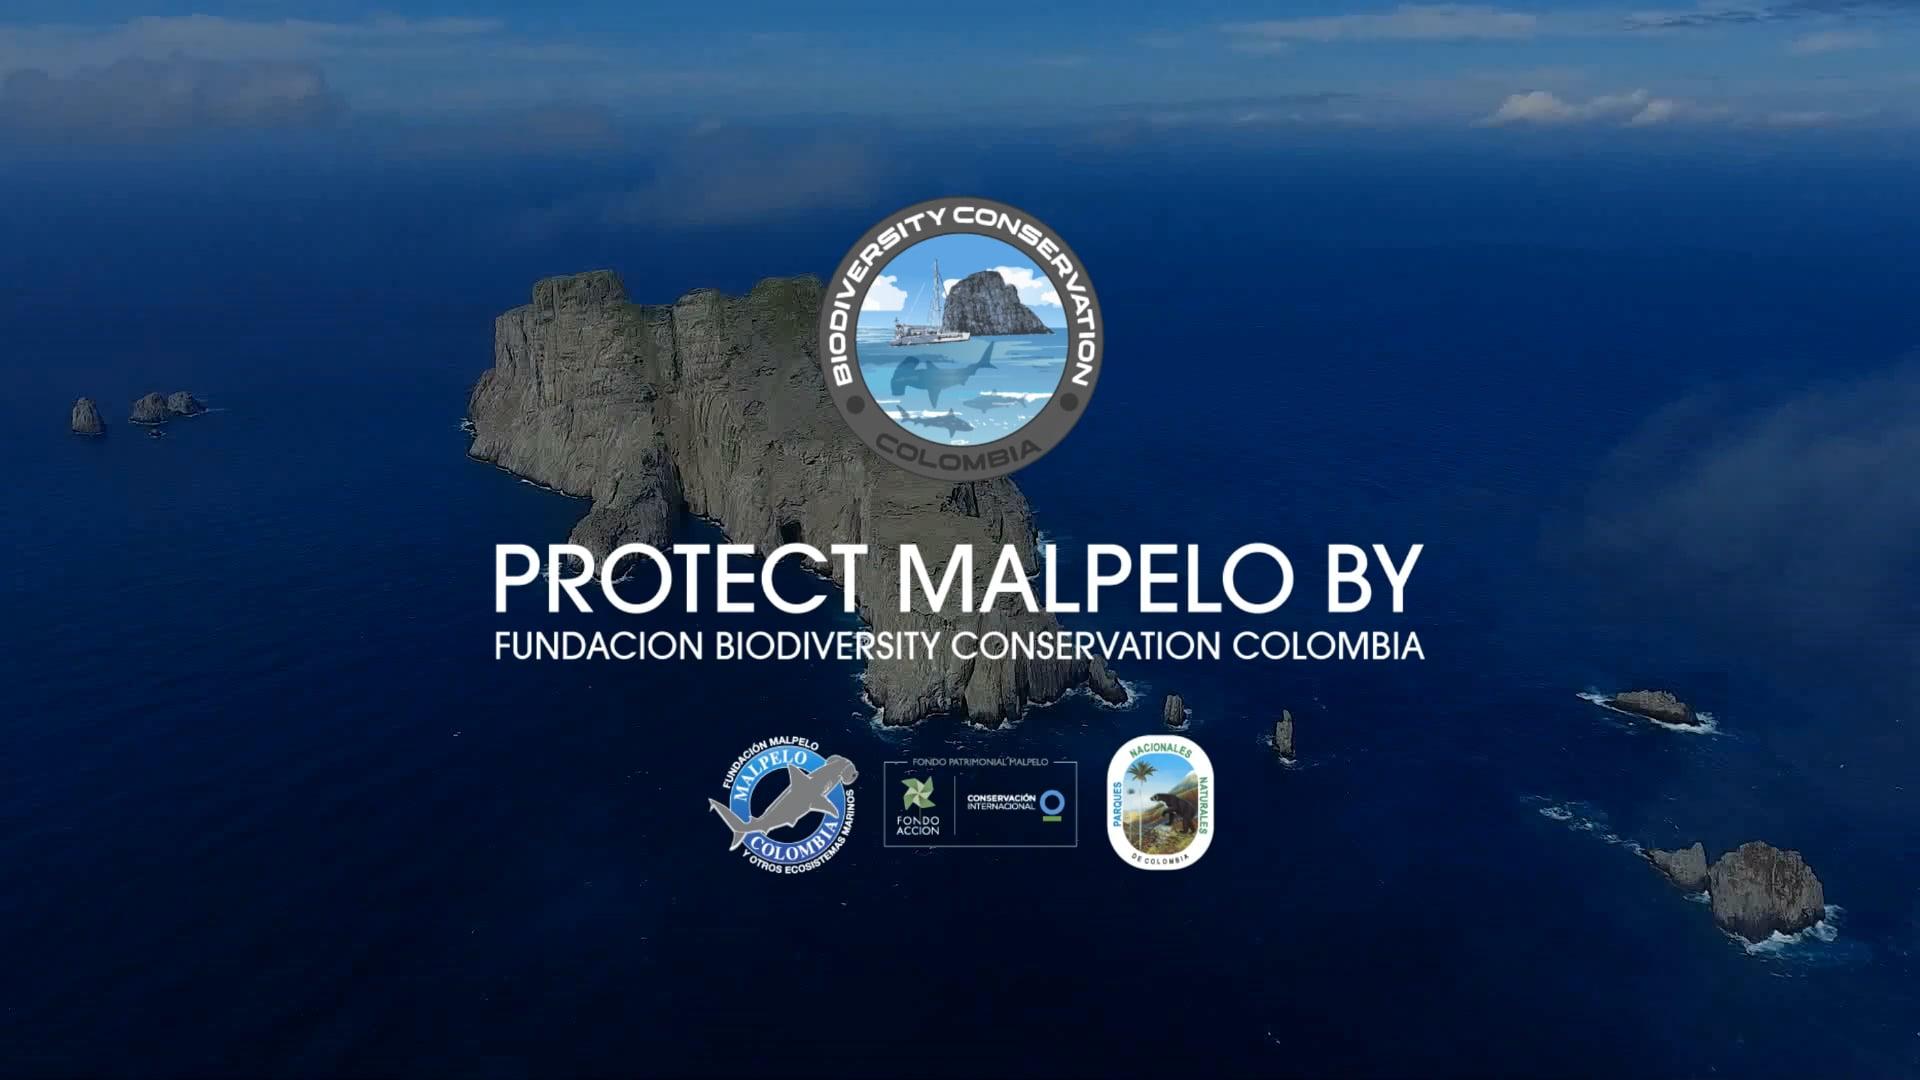 FUNDACION BIODIVERSITY CONSERVATION COLOMBIA